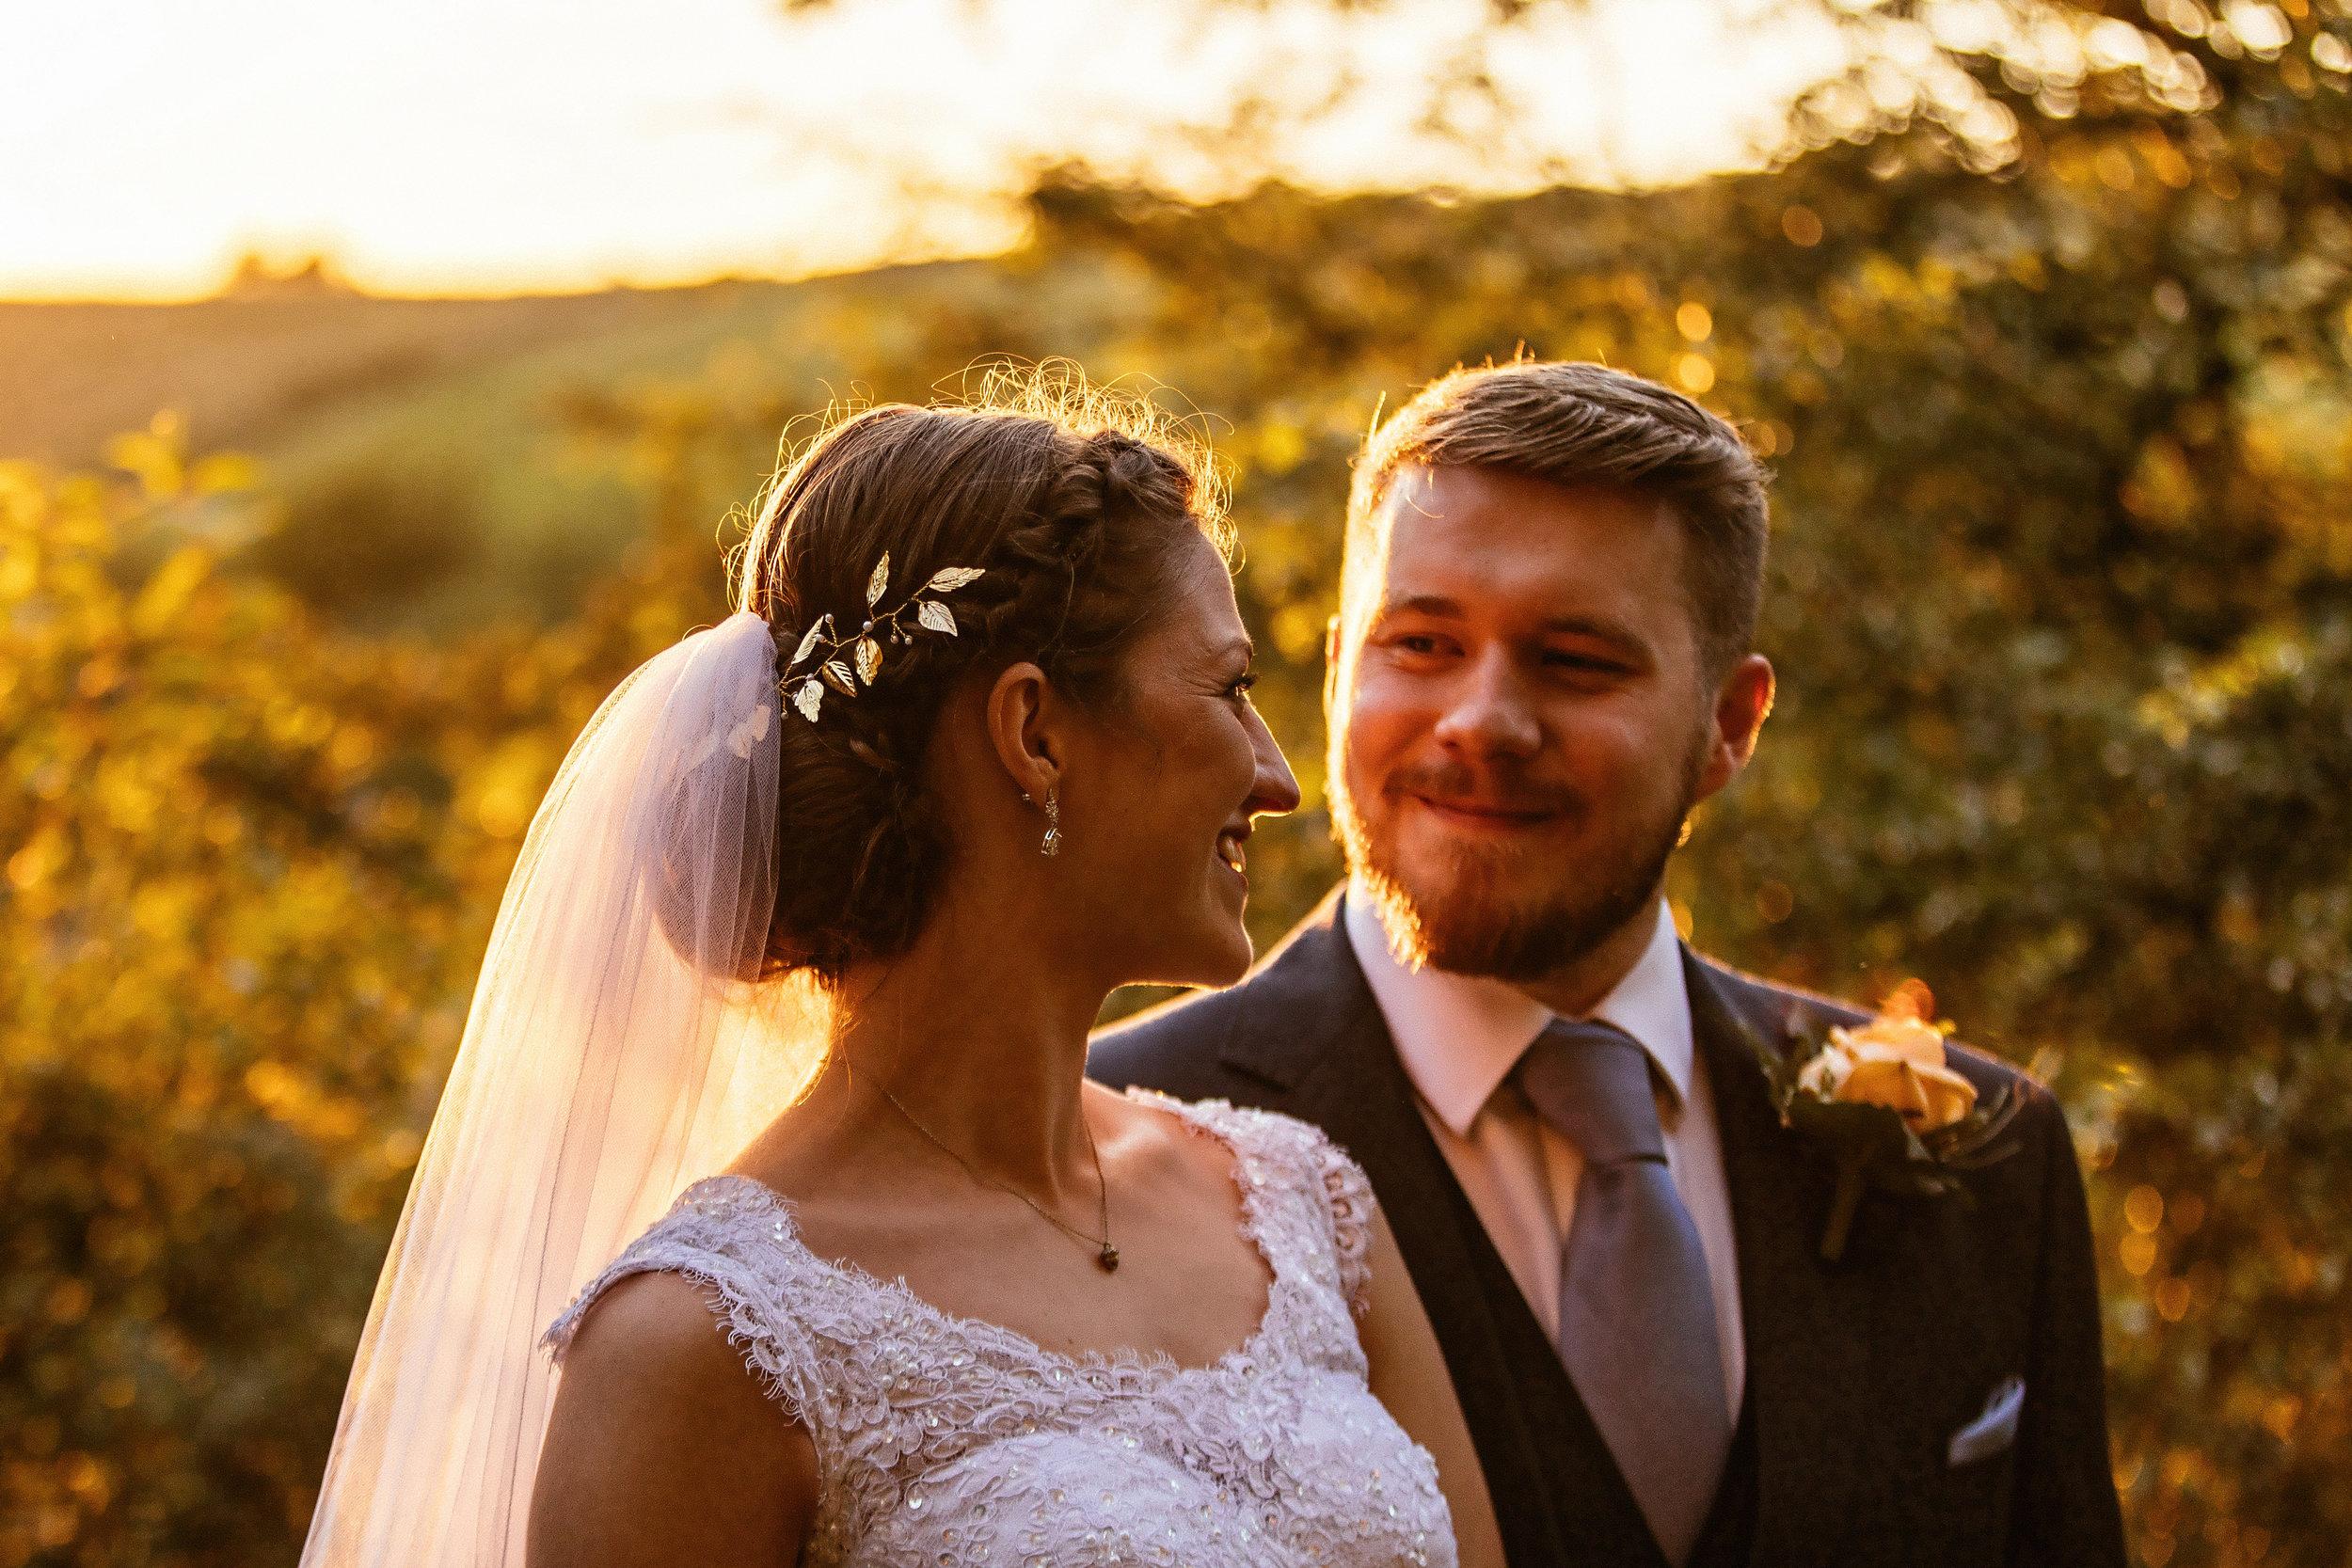 Kathryn-and-Mike-Wedding-Highlights-100.jpg